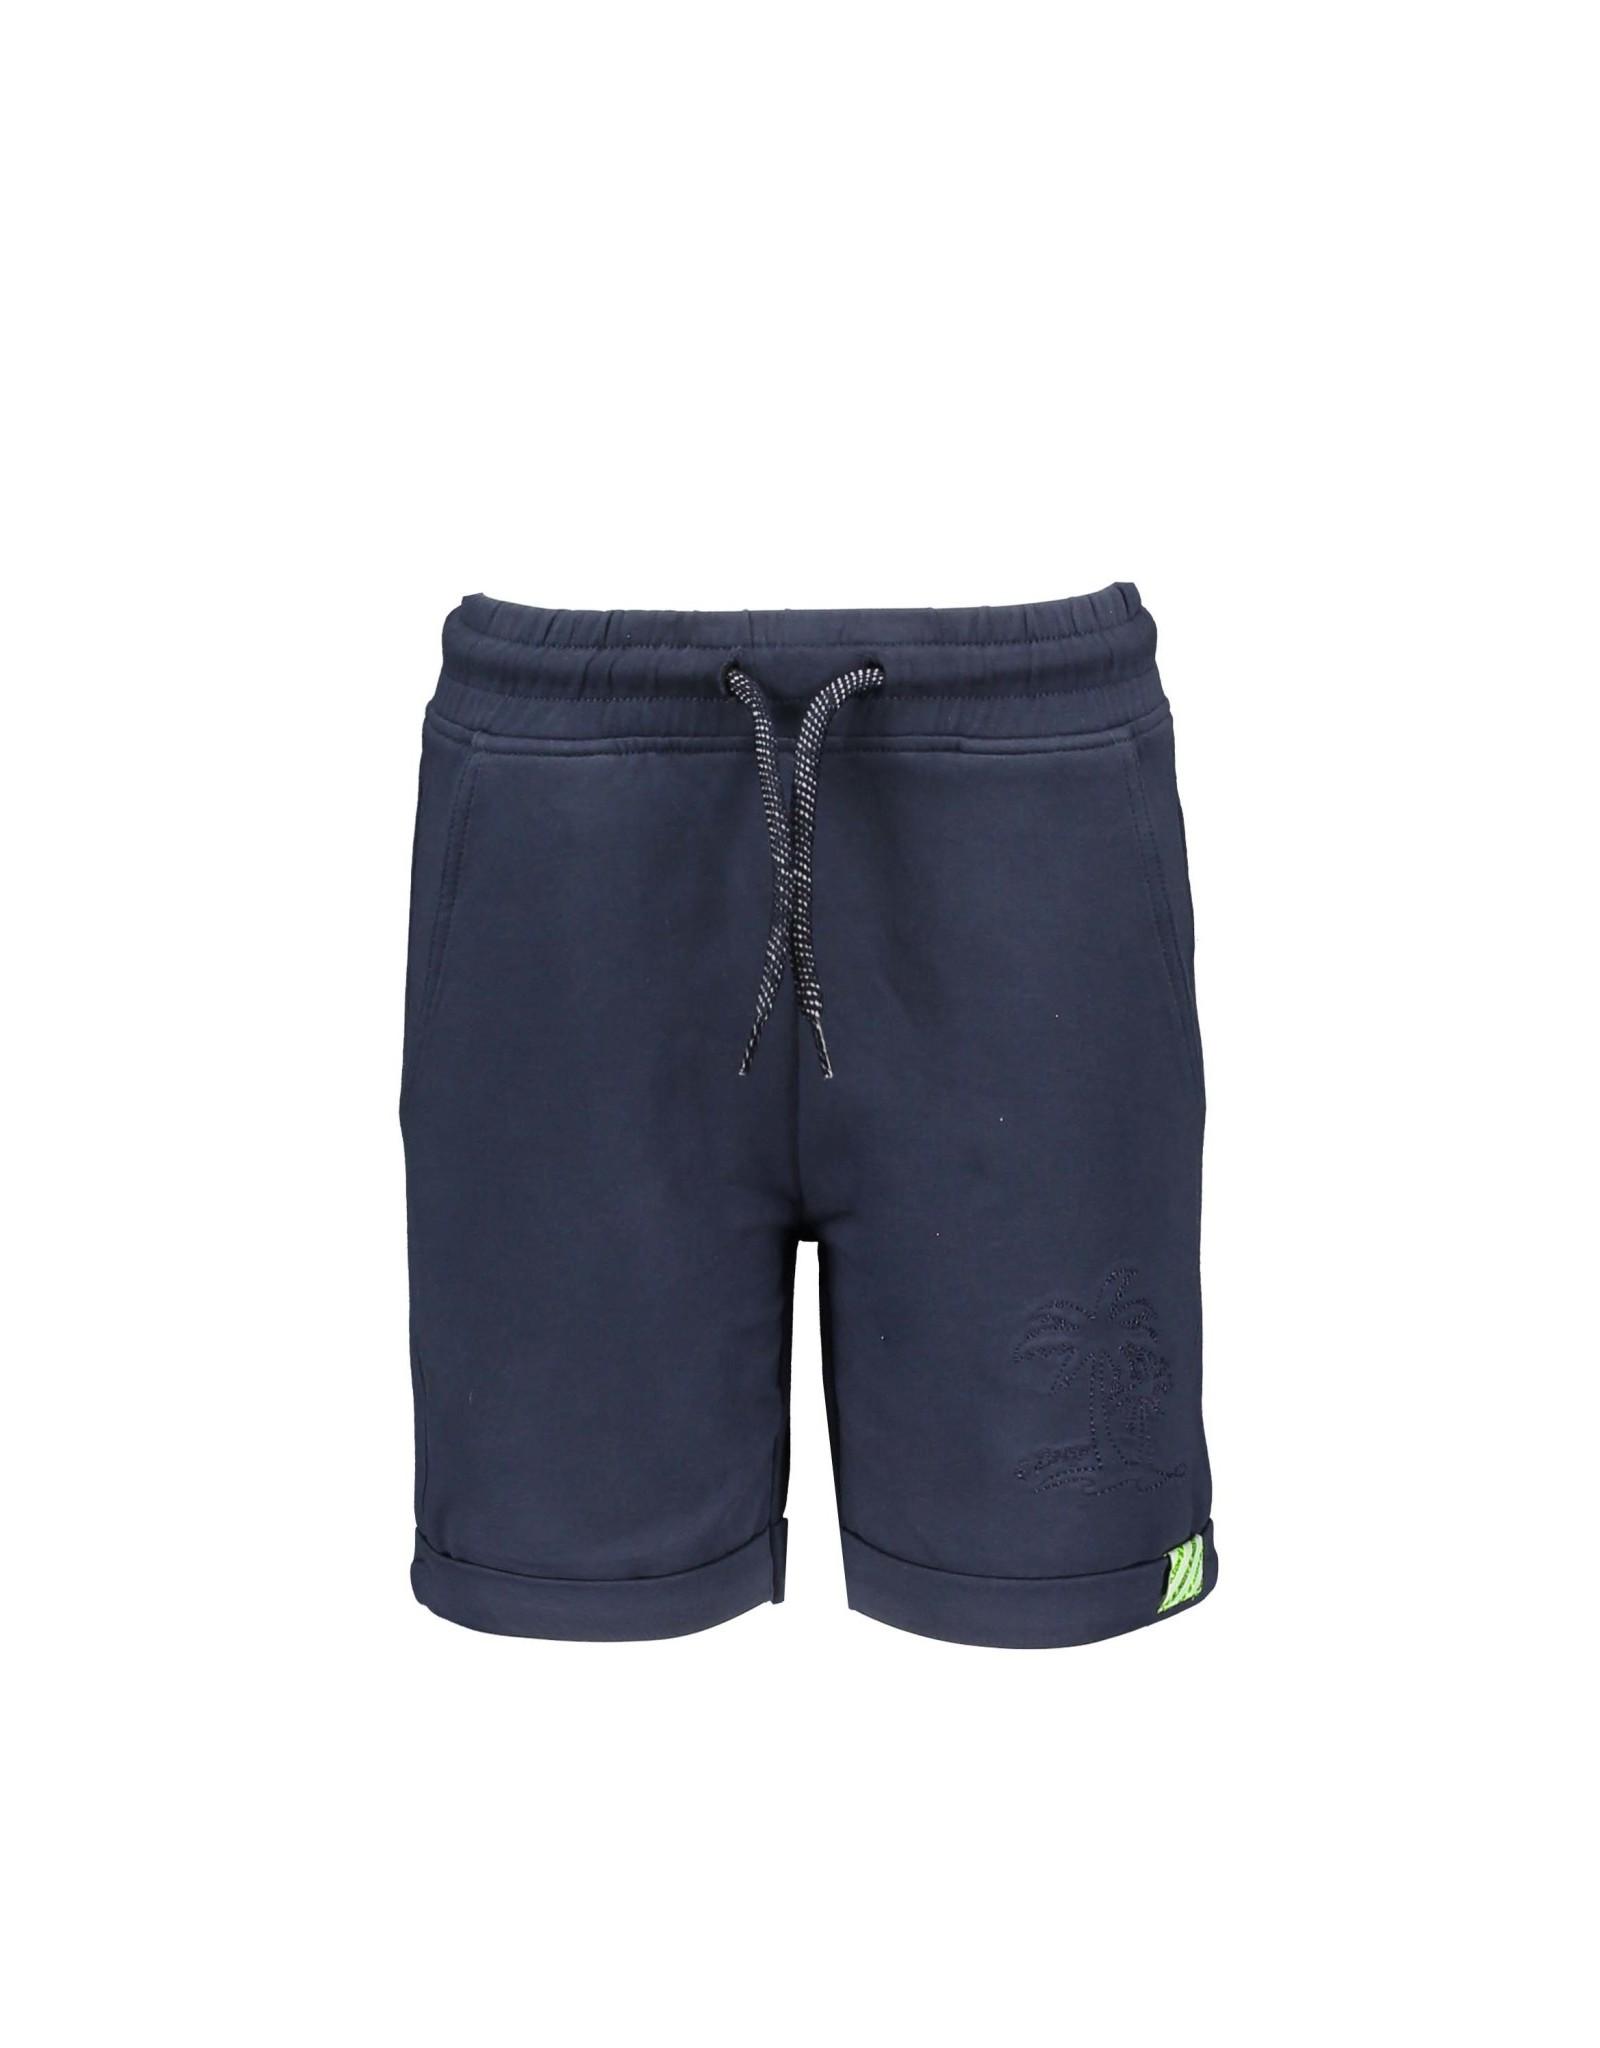 B.Nosy B.Nosy jongens korte joggingbroek Oxford Blue S21